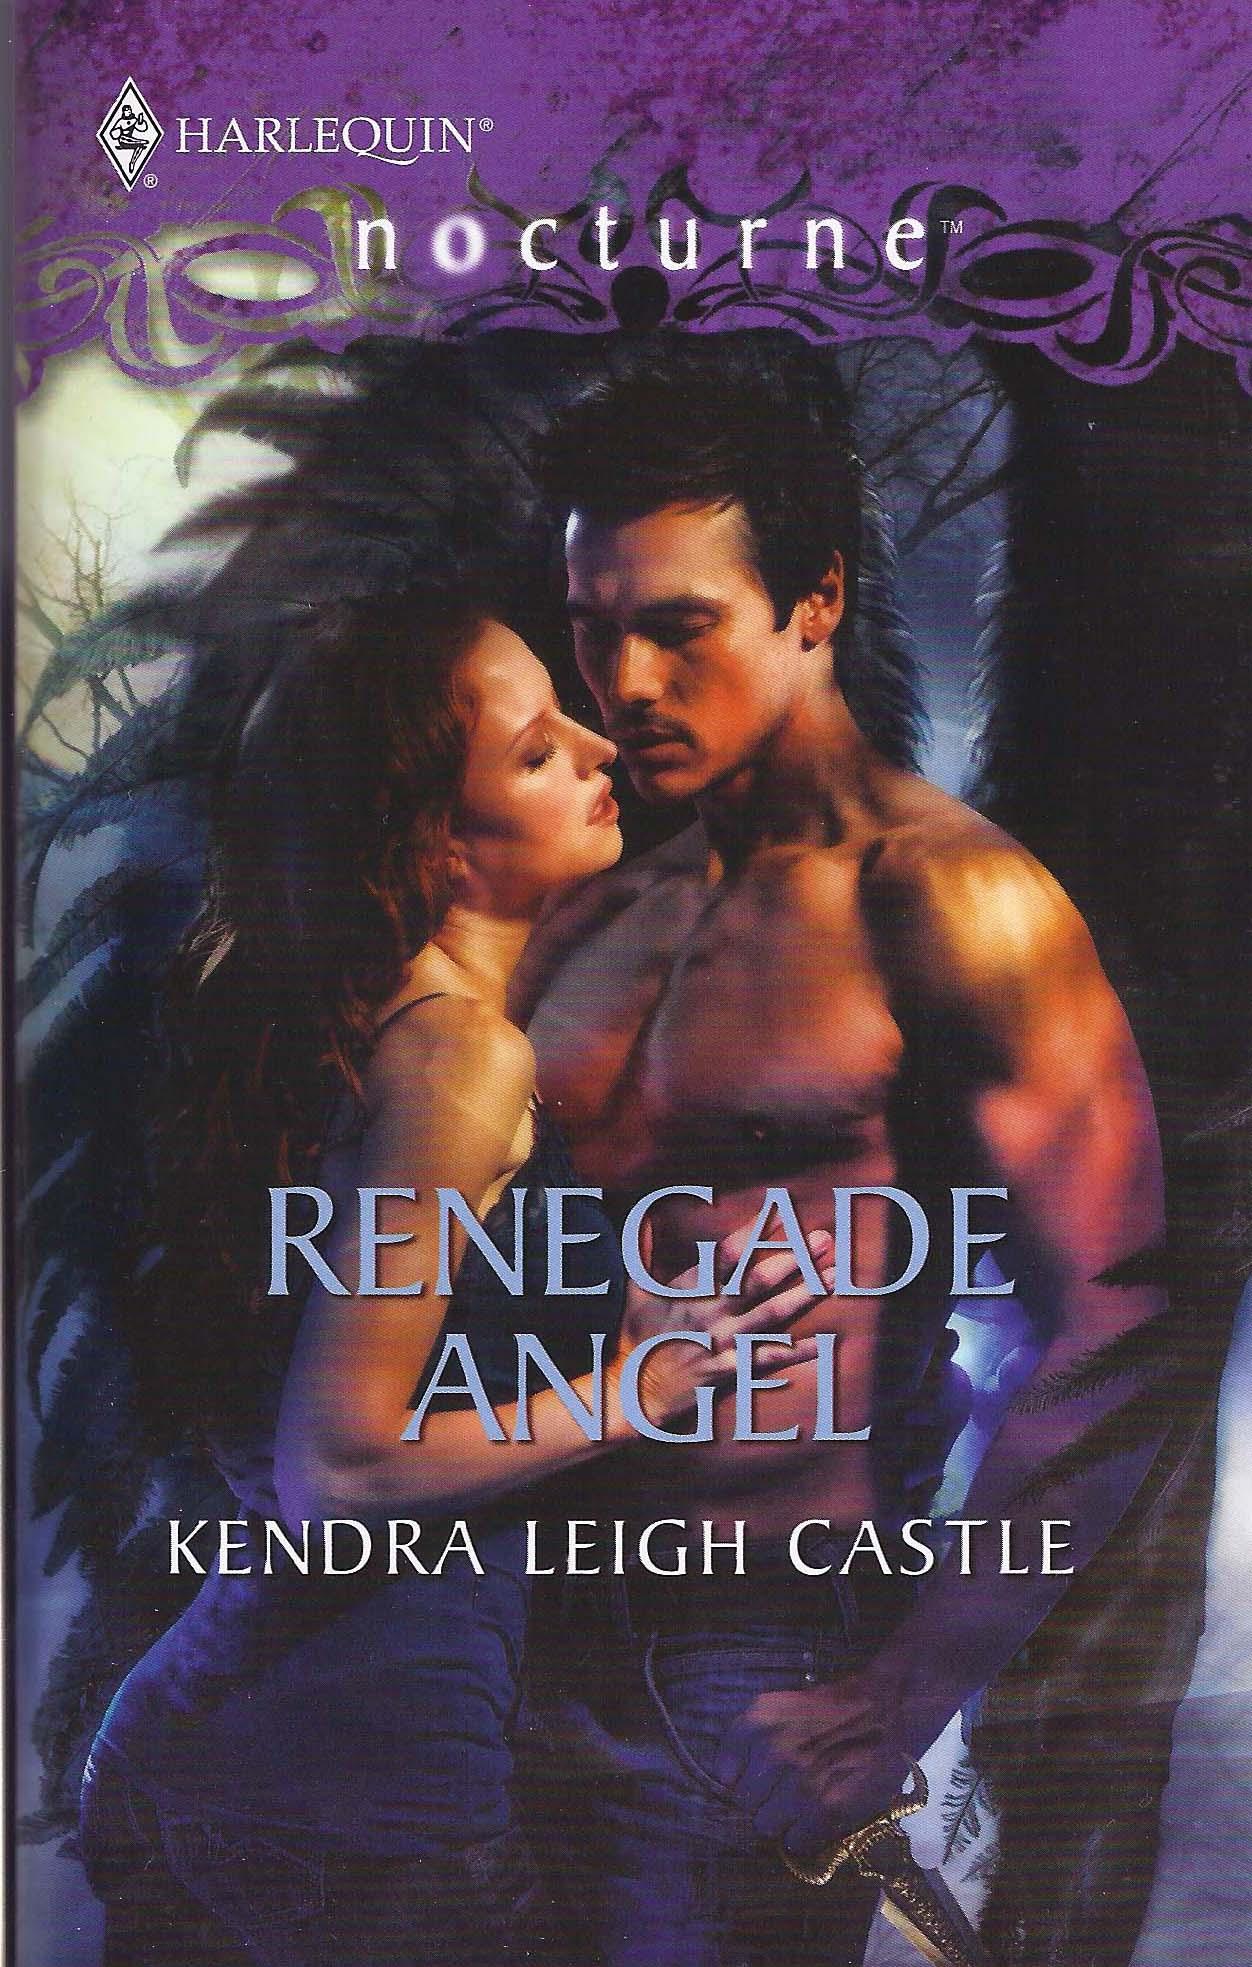 earthbound angel harlequin romance